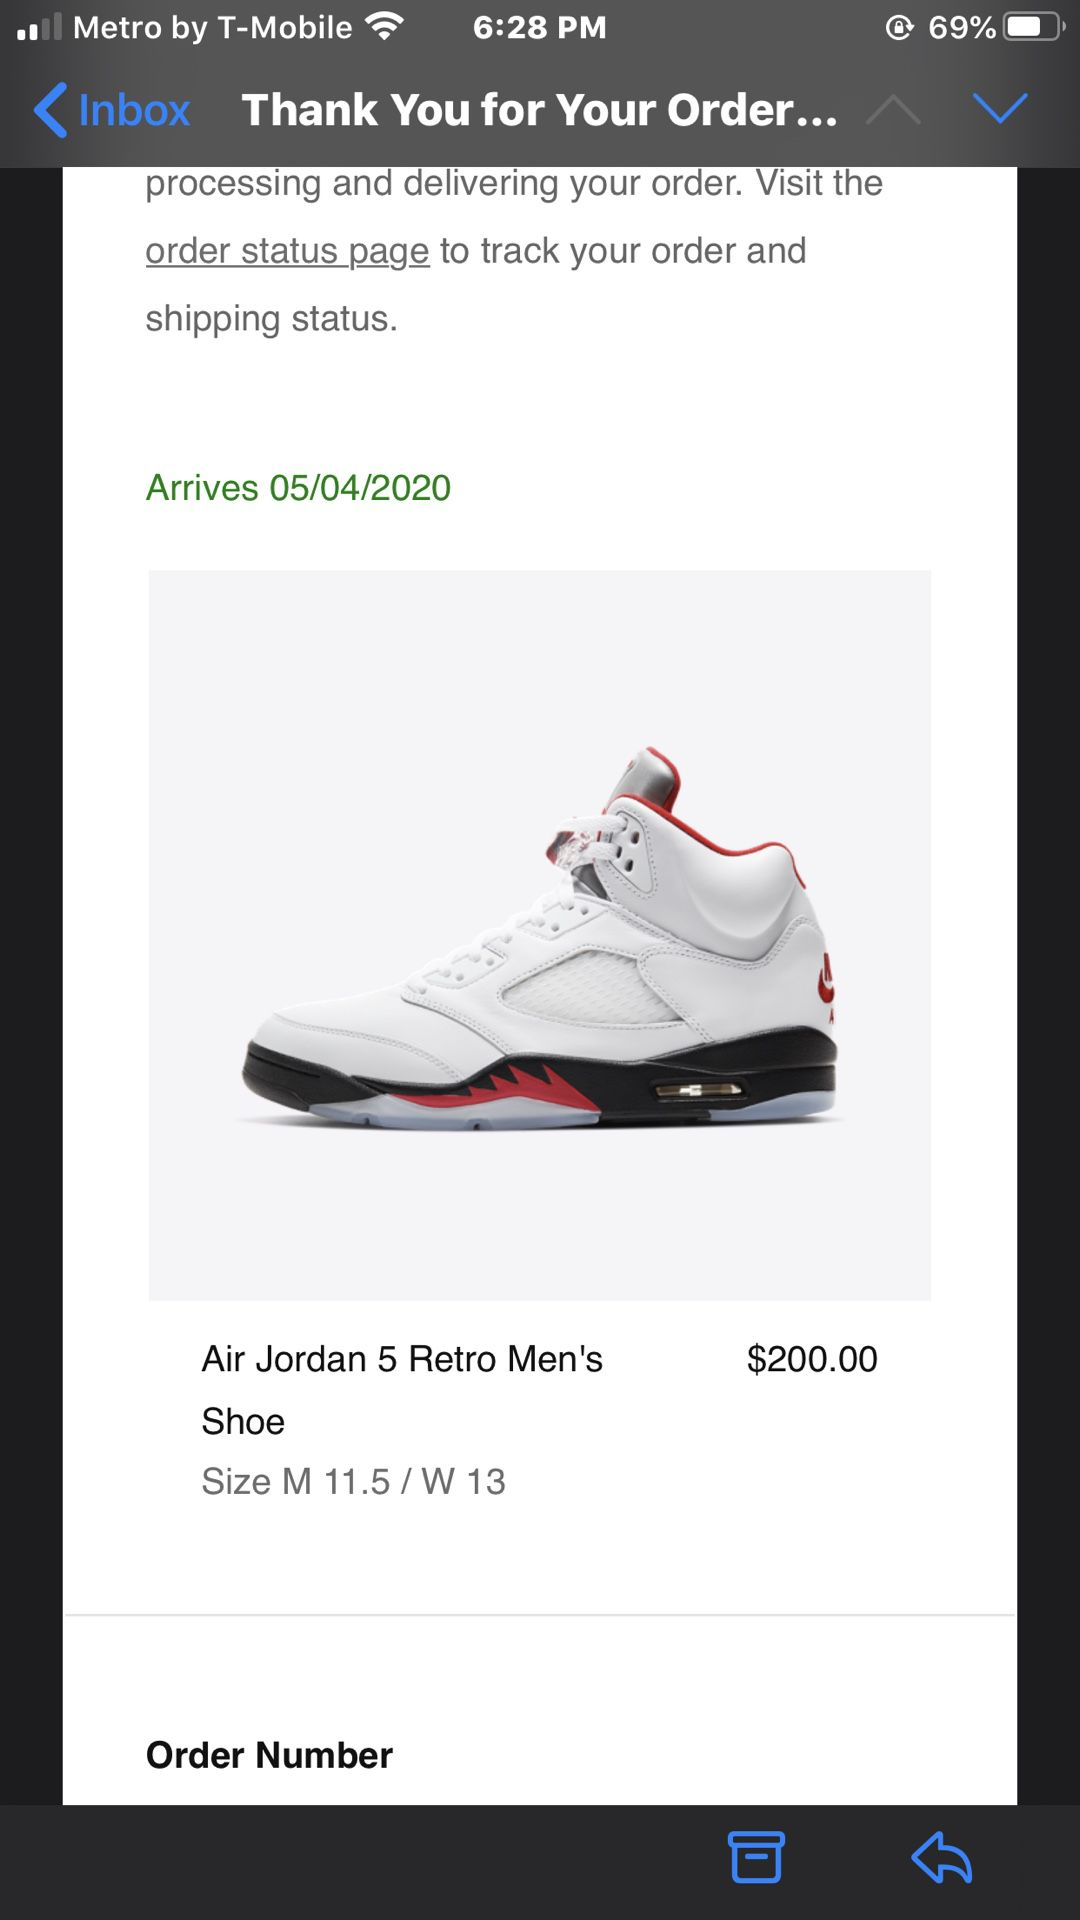 Fire Red Jordan 5